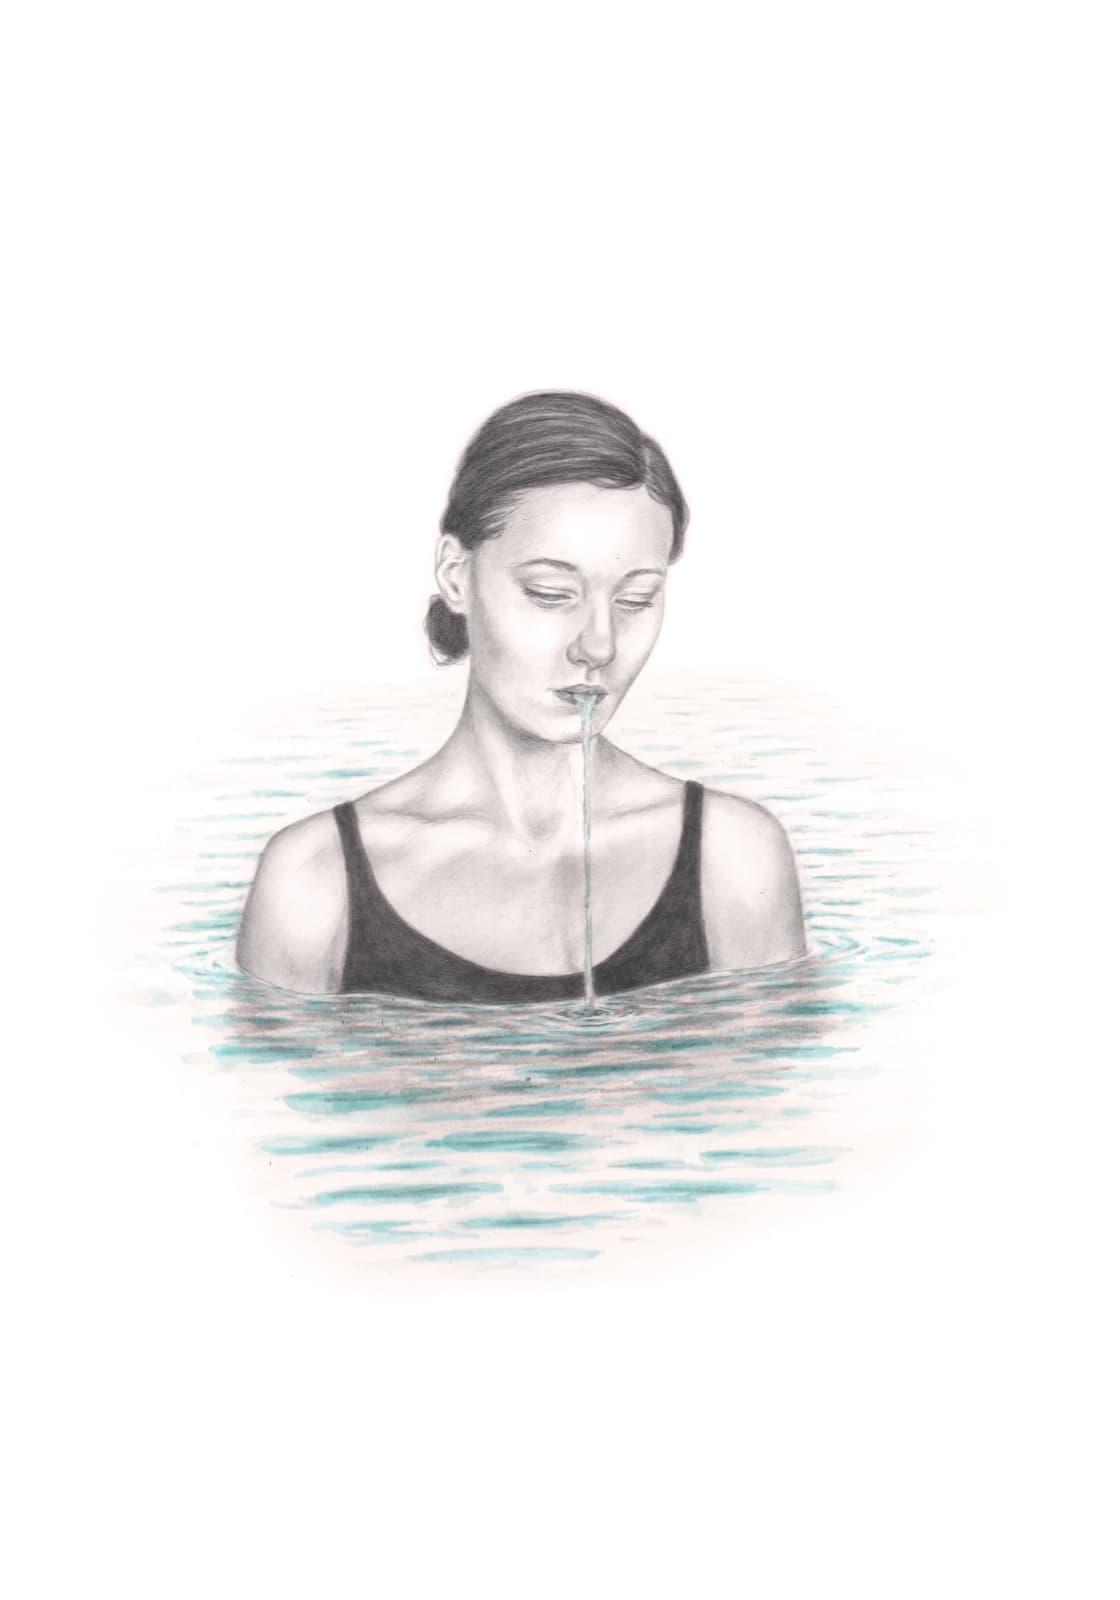 Rachel Goodyear, Dribble, 2021